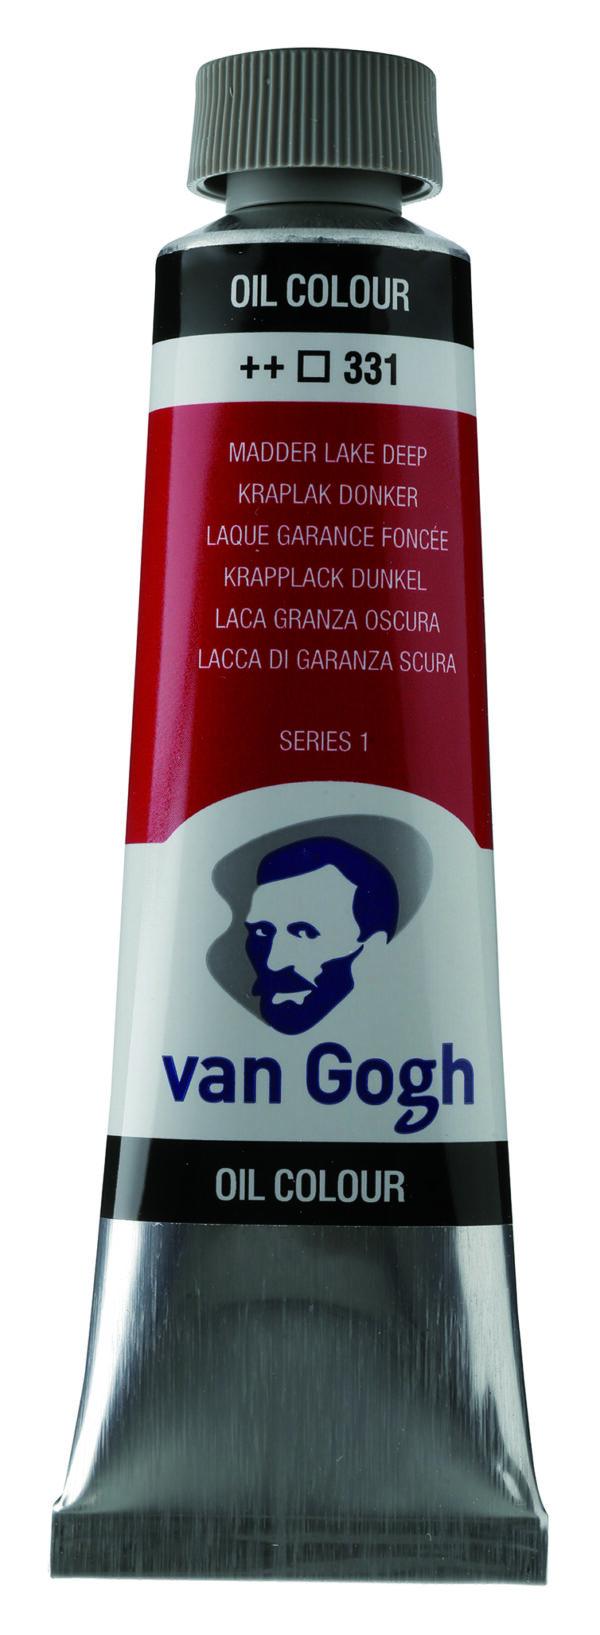 Van Gogh 331 Madder laker Deep - 40 ml